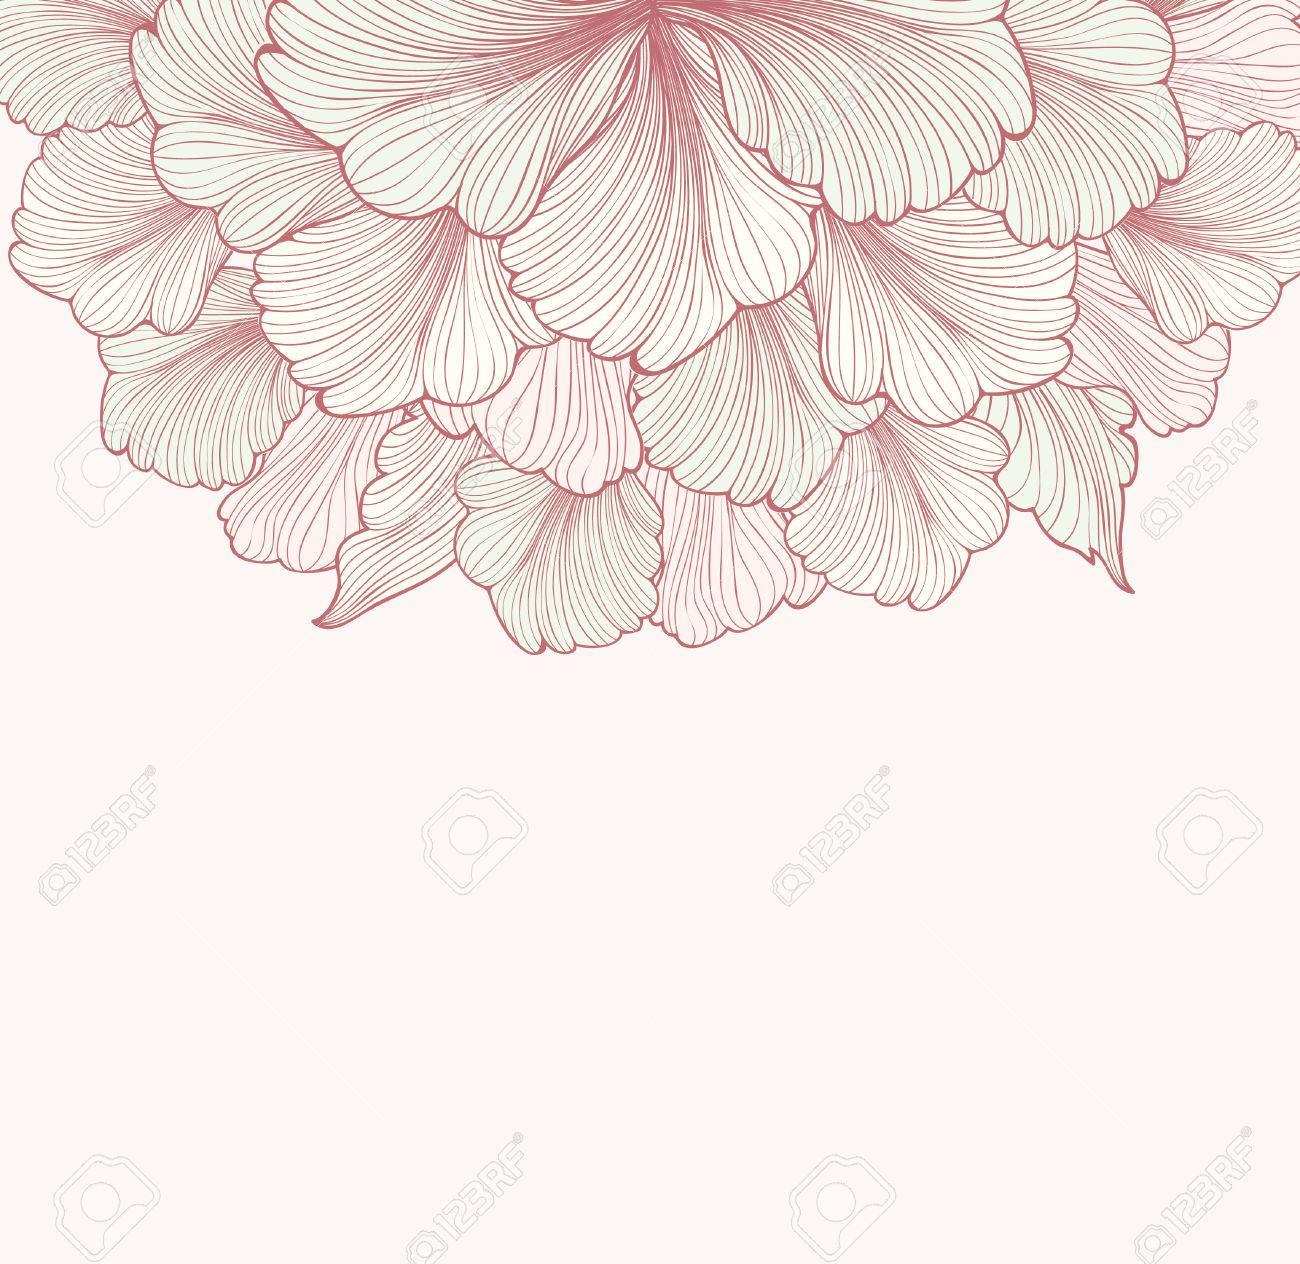 Floral background with flower. Element for design. Vector illustration. Stock Vector - 50791948